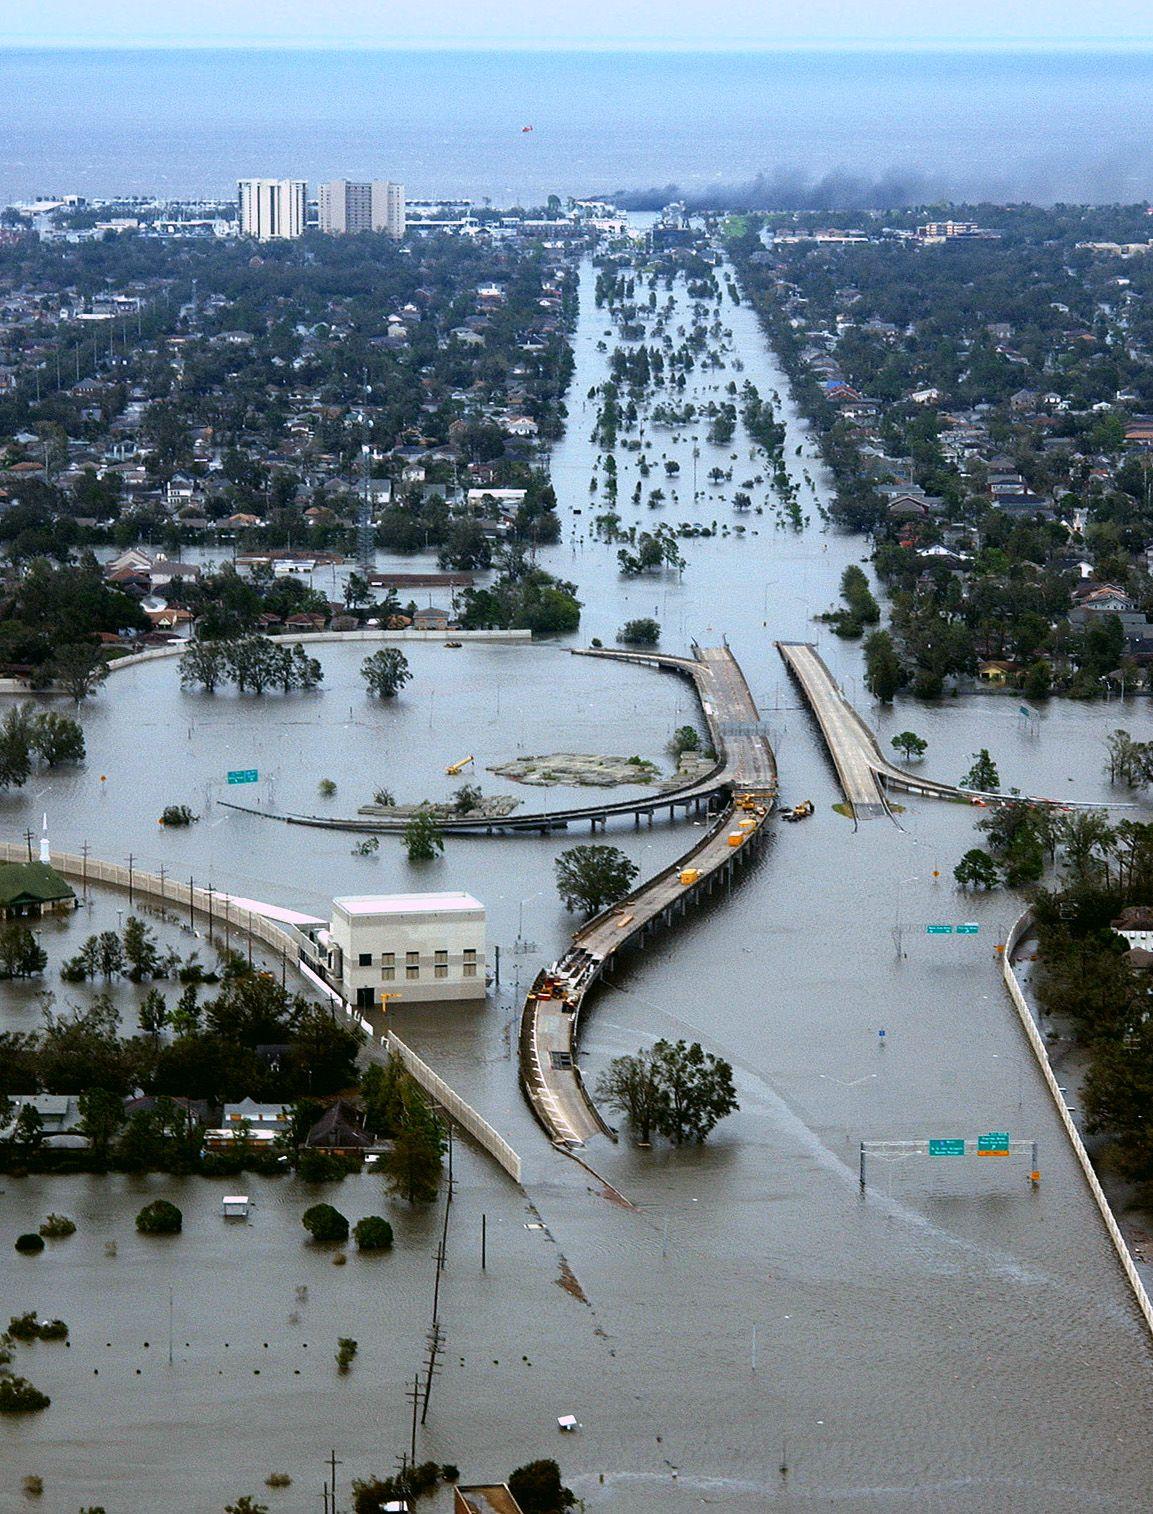 Images Katrina New Orleans Natural Disasters Hurricane Katrina Orleans